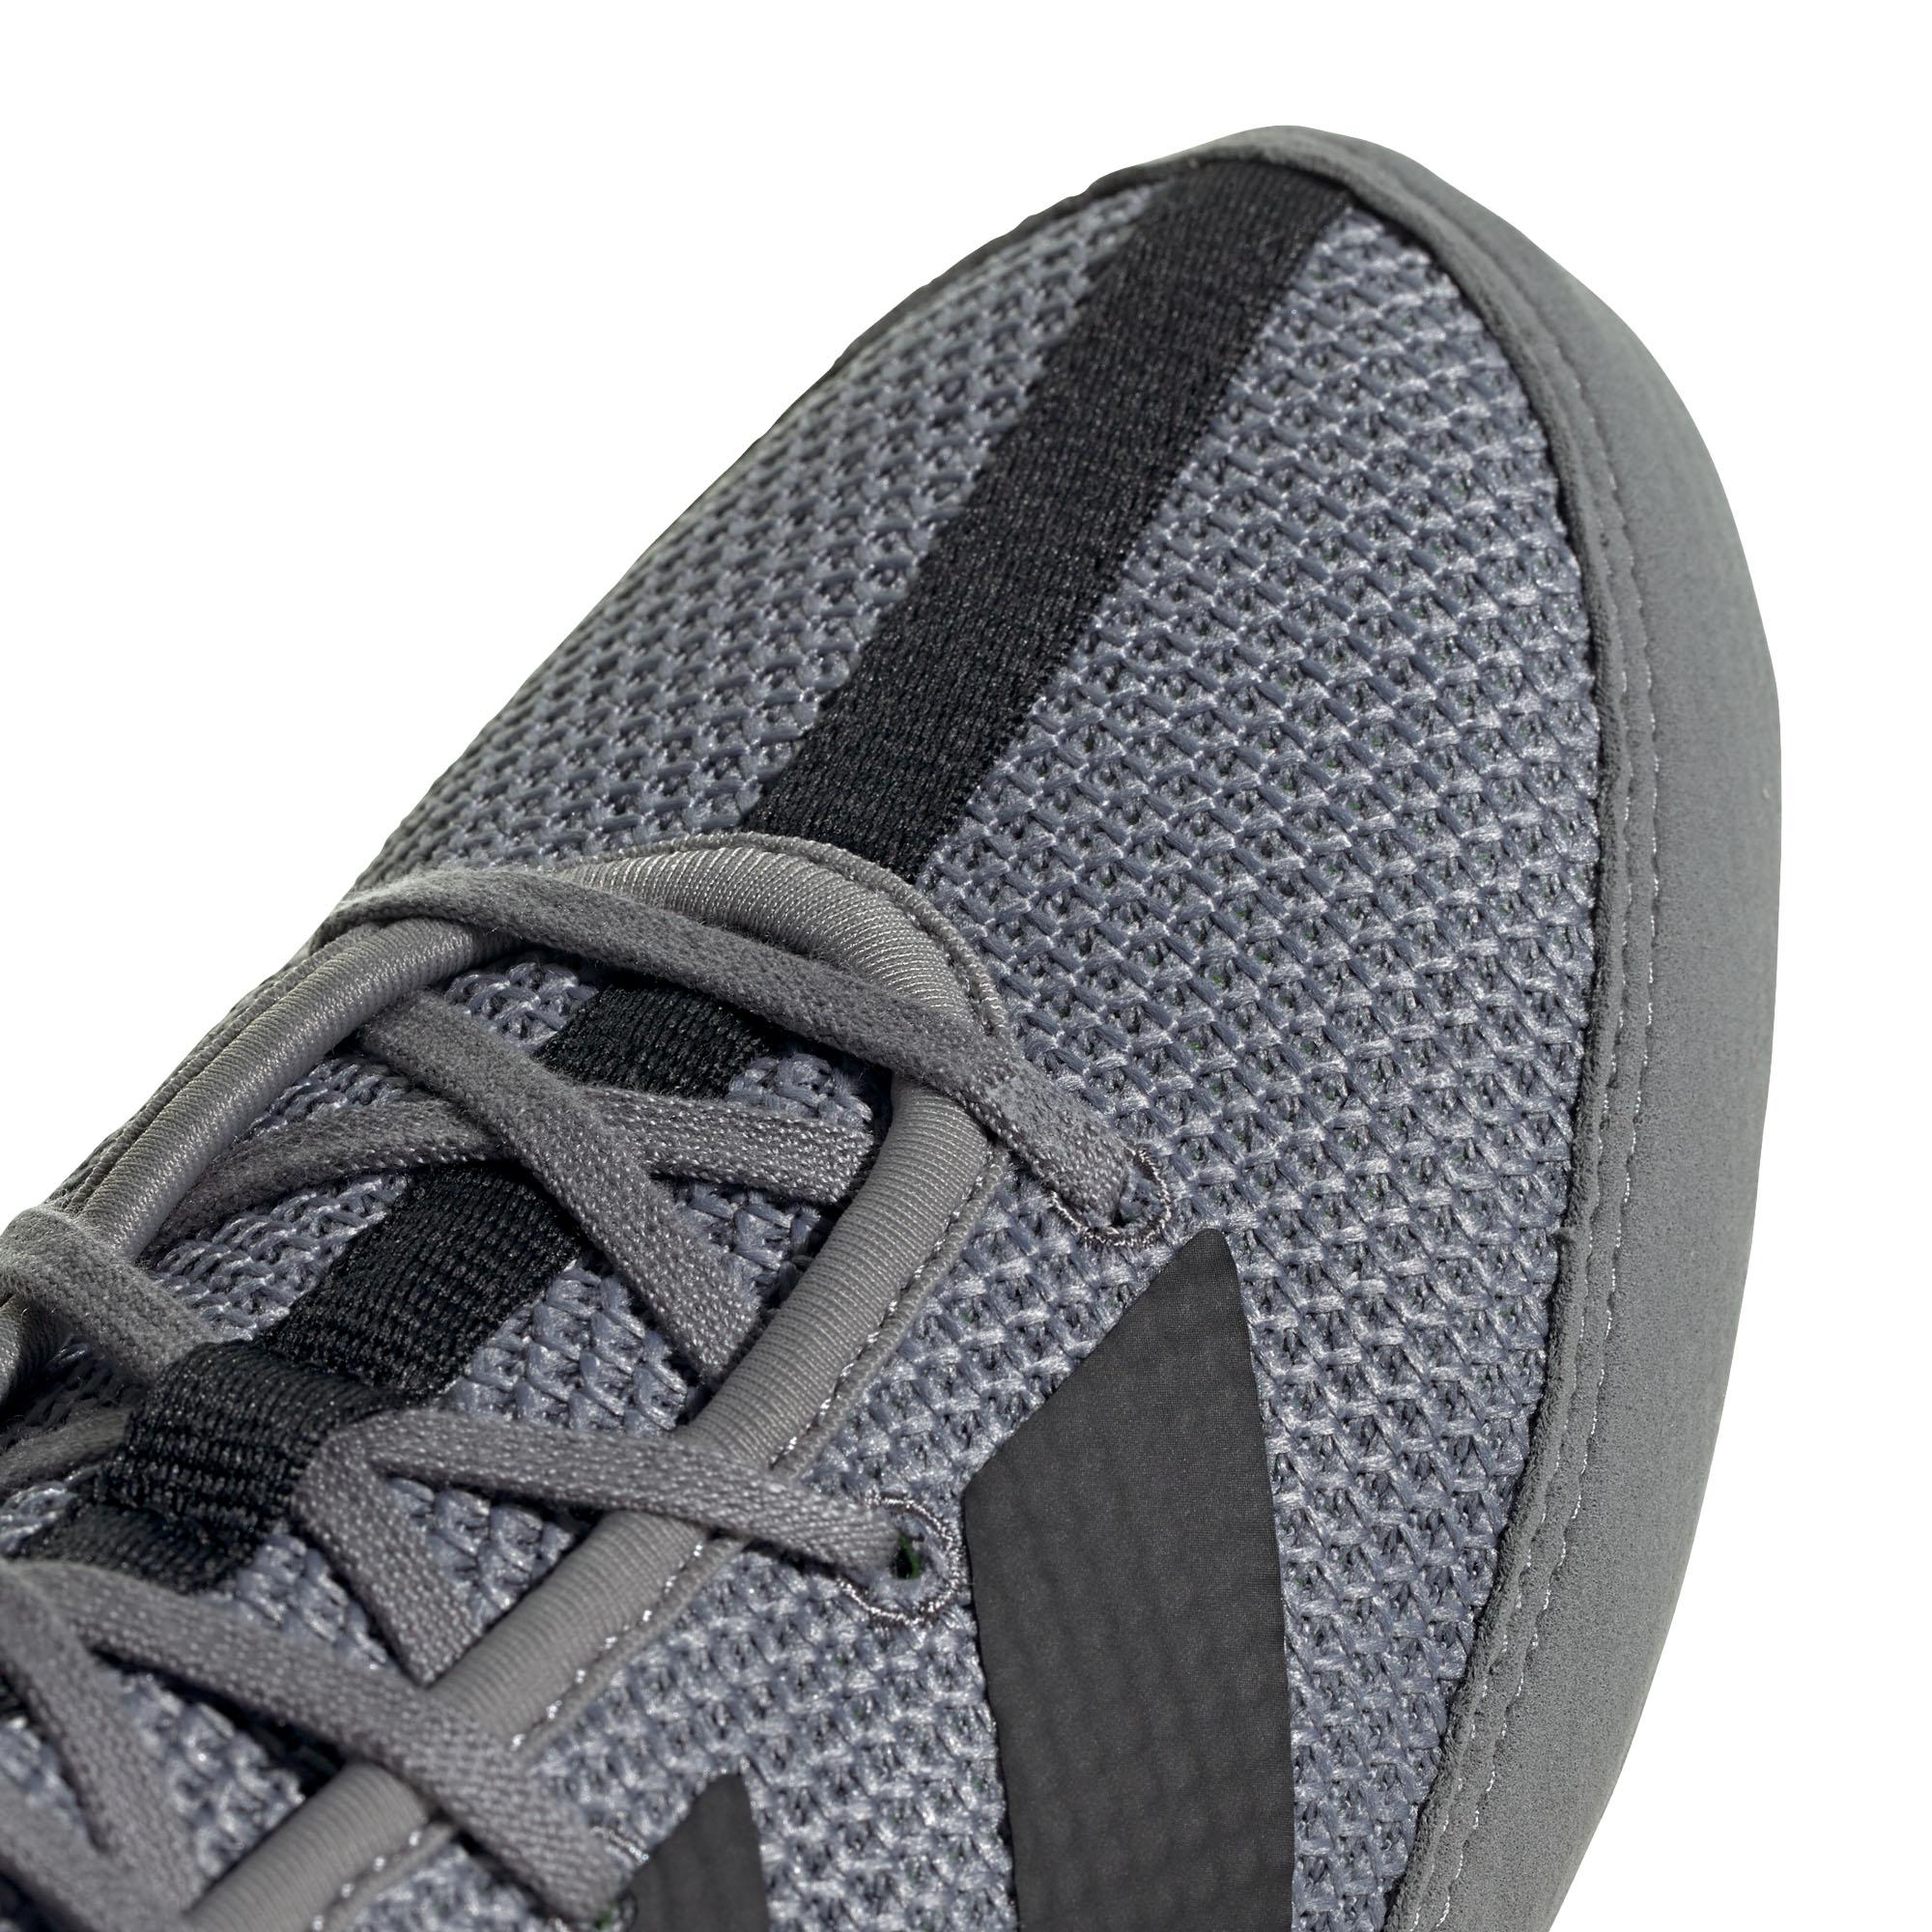 miniature 10 - Adidas Box Hog 3 boxe Trainer Shoe Boot gris/vert